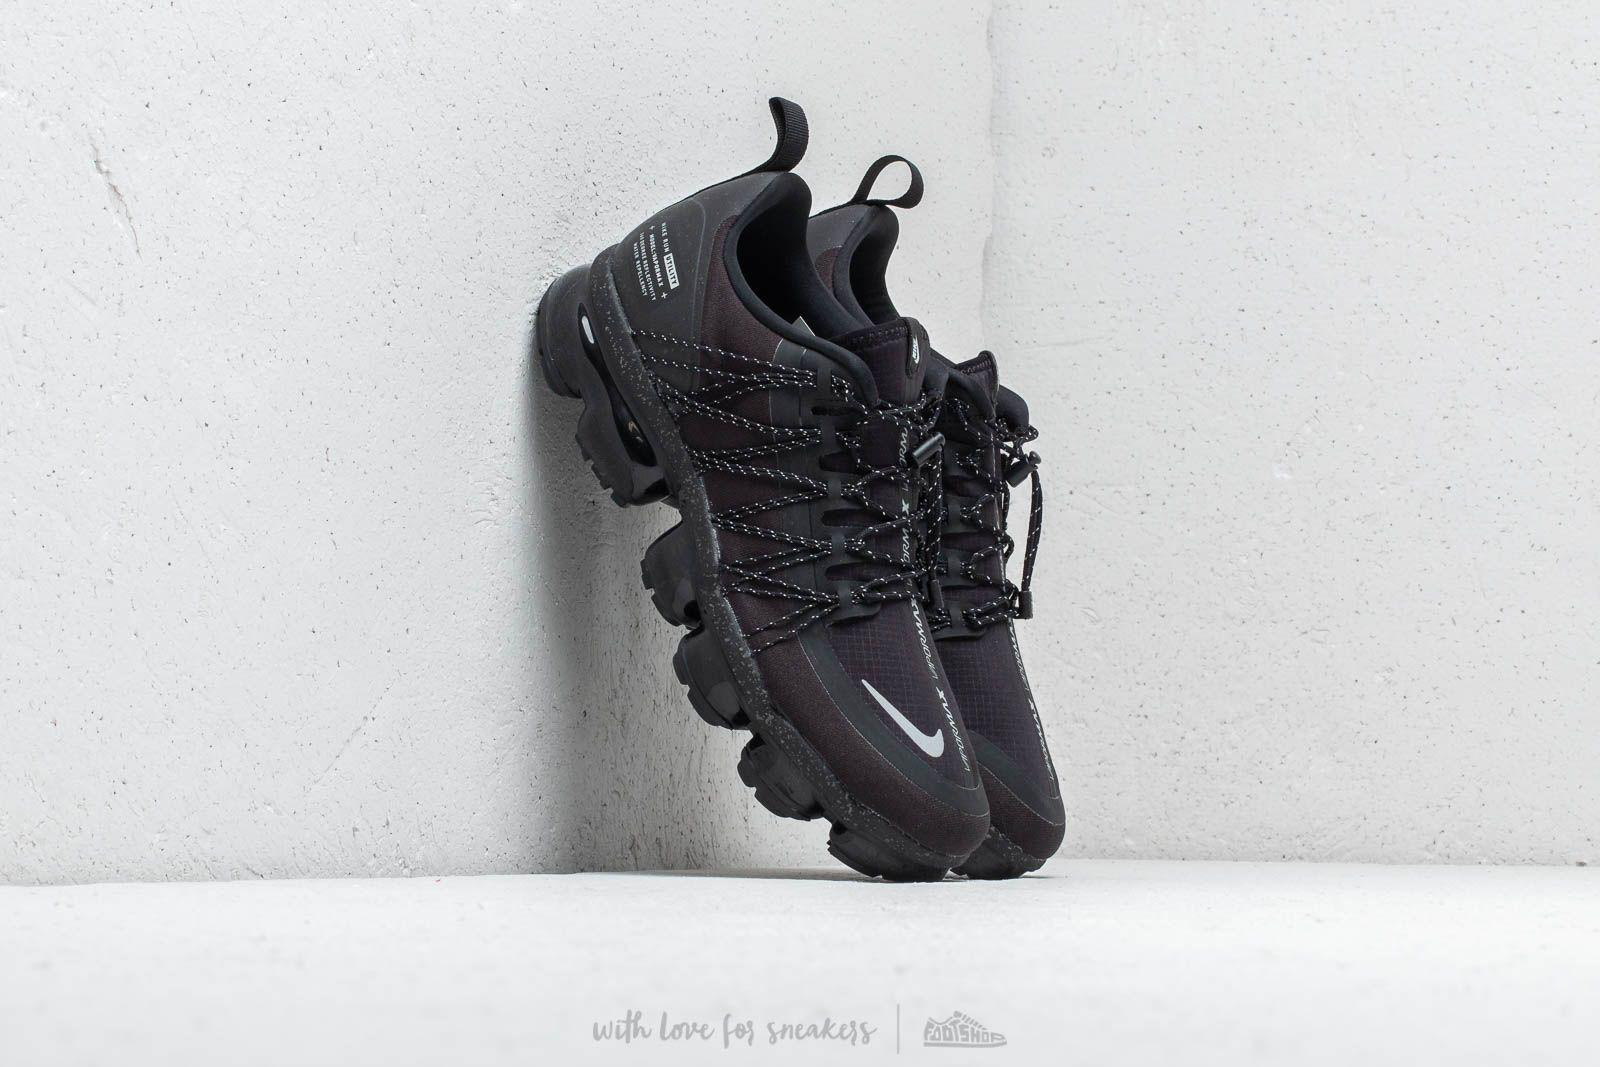 Lyst - Nike Air Vapormax Run Utility Black  Reflect Silver- Black in ... d90ca0db0